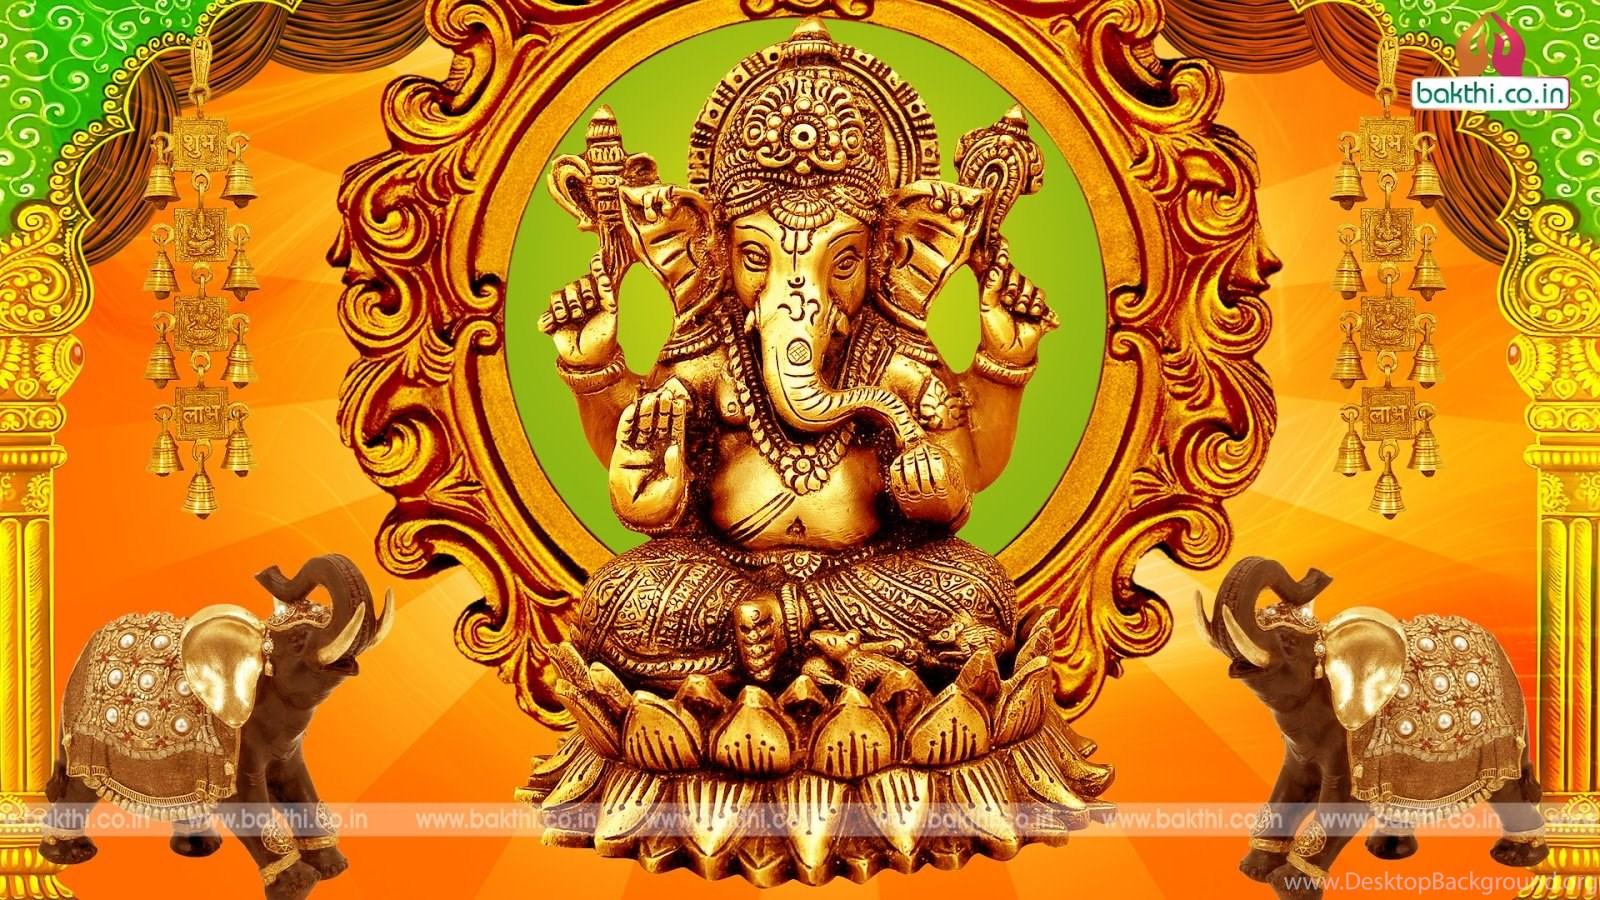 Vinayagar Animation Wallpaper Lord Ganesha Hd Wallpapers With Creative Design Desktop